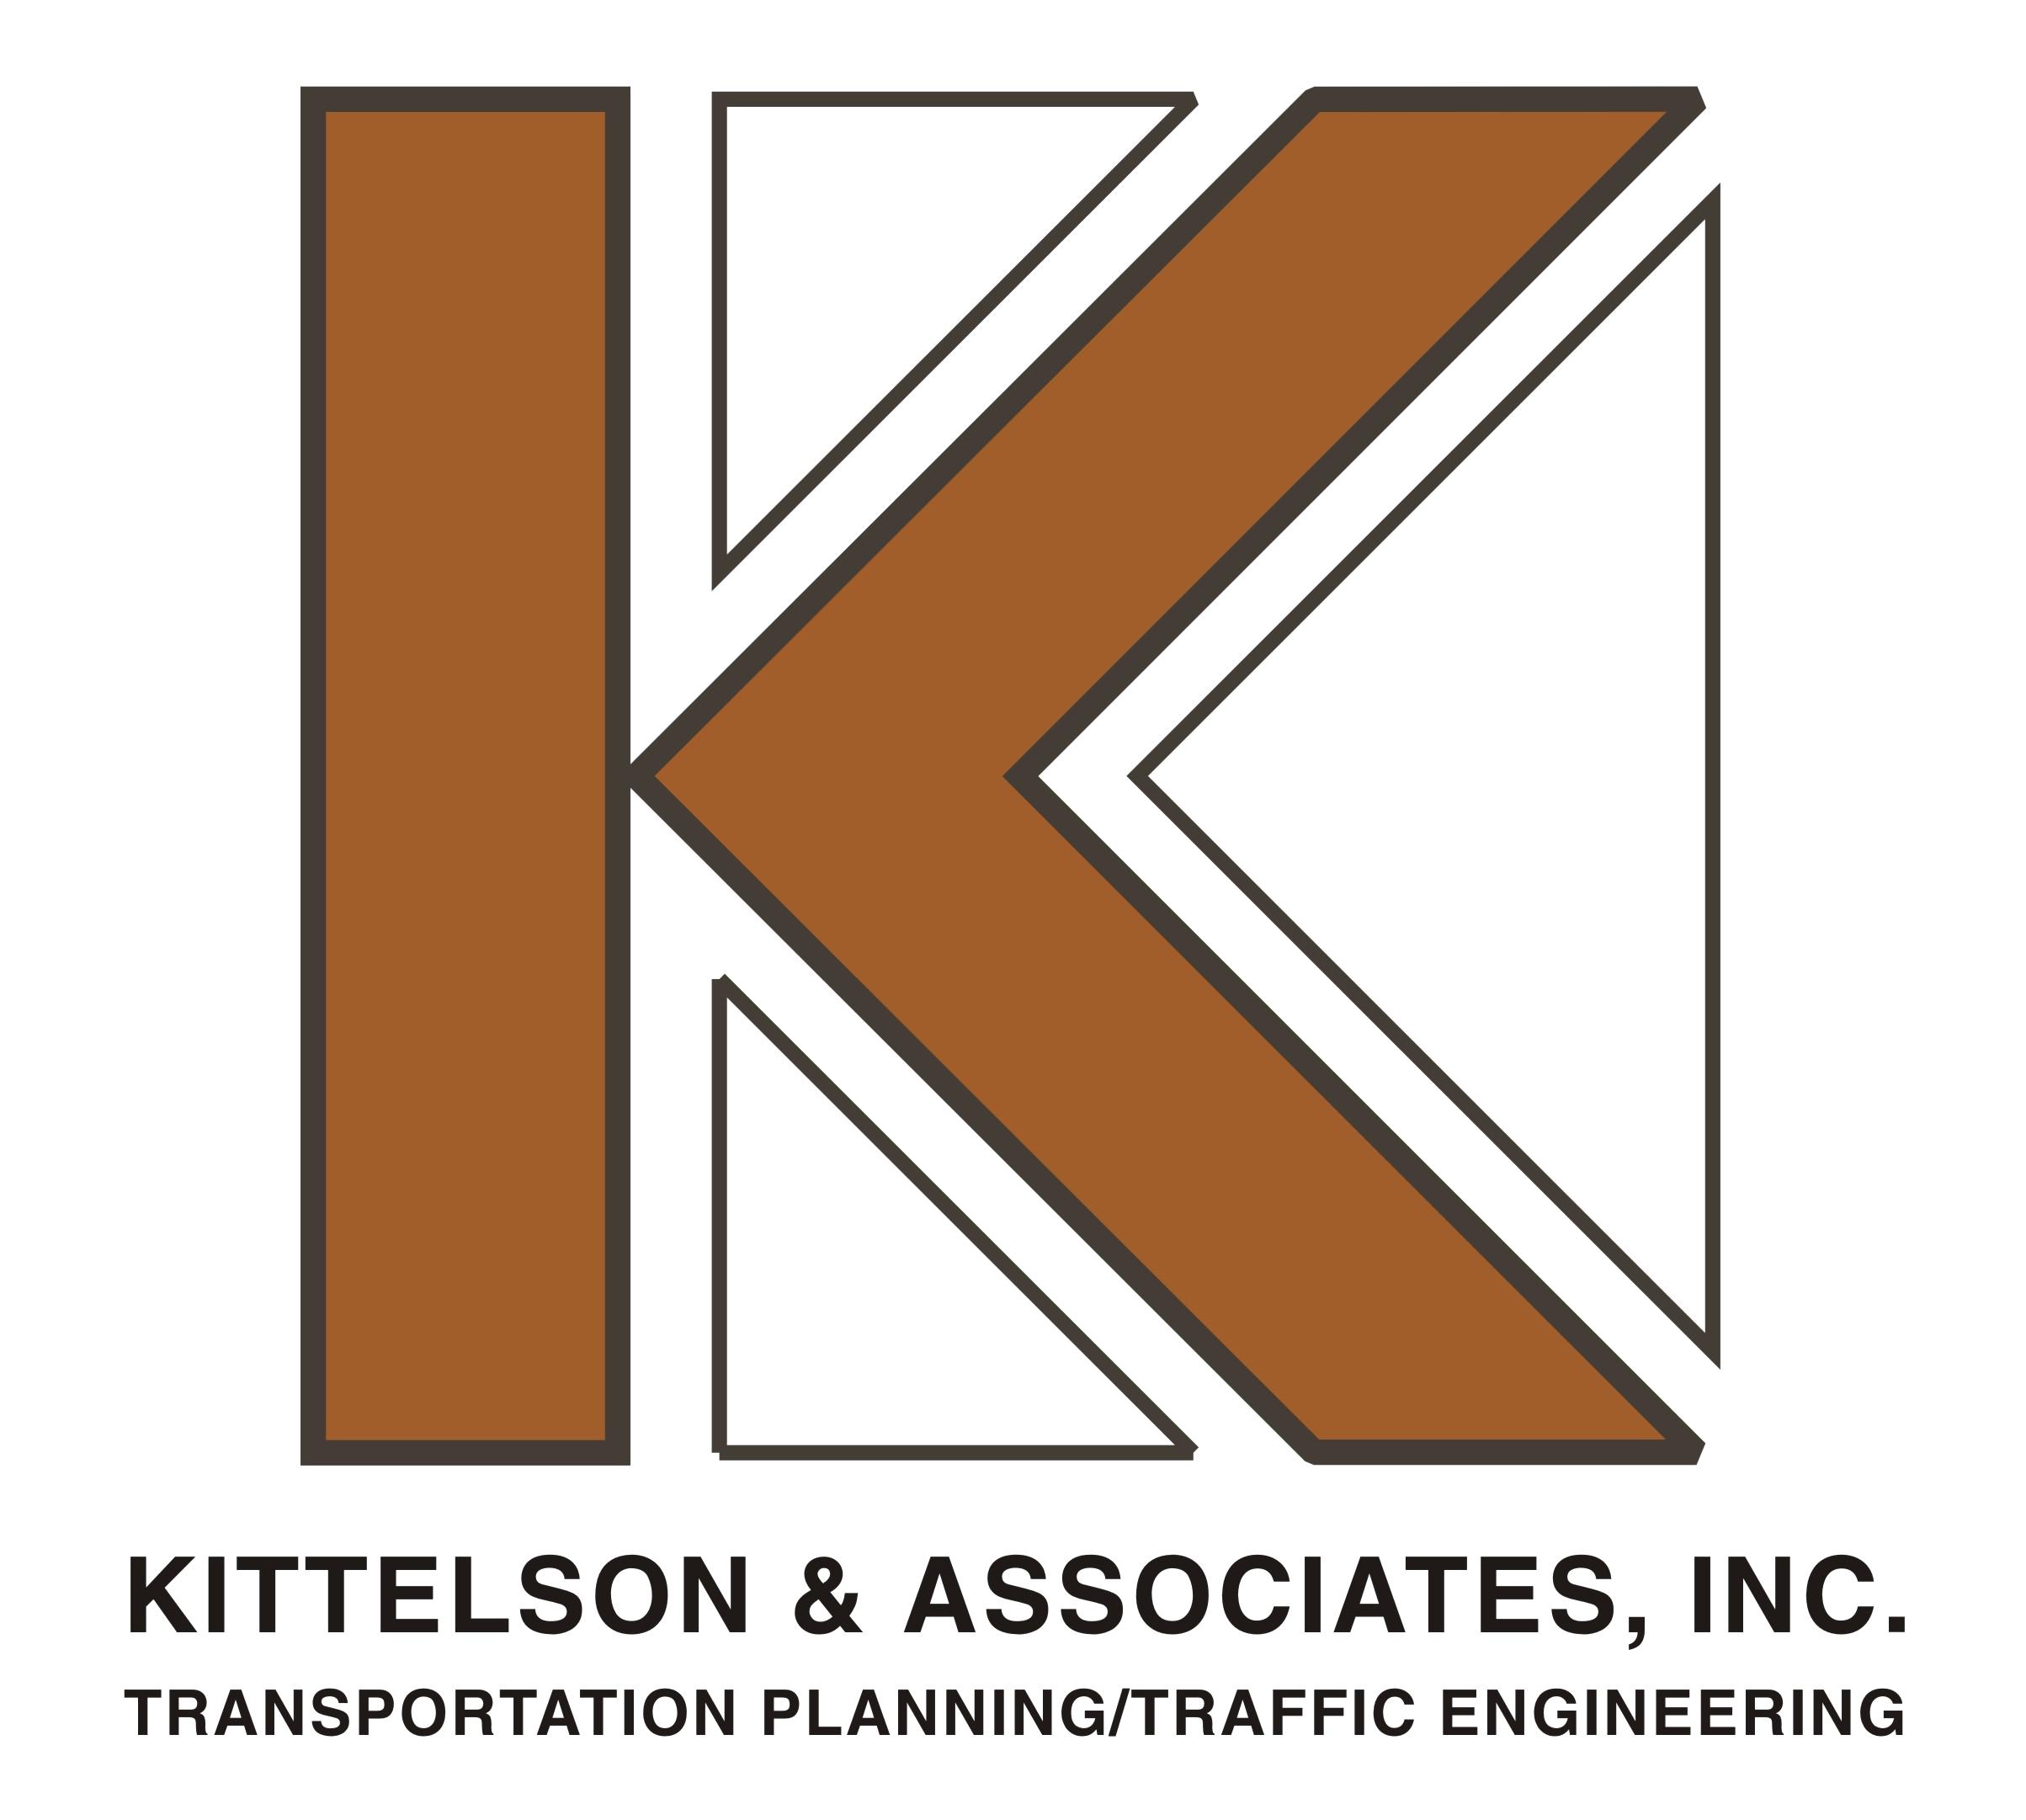 Kittelson_(1).png